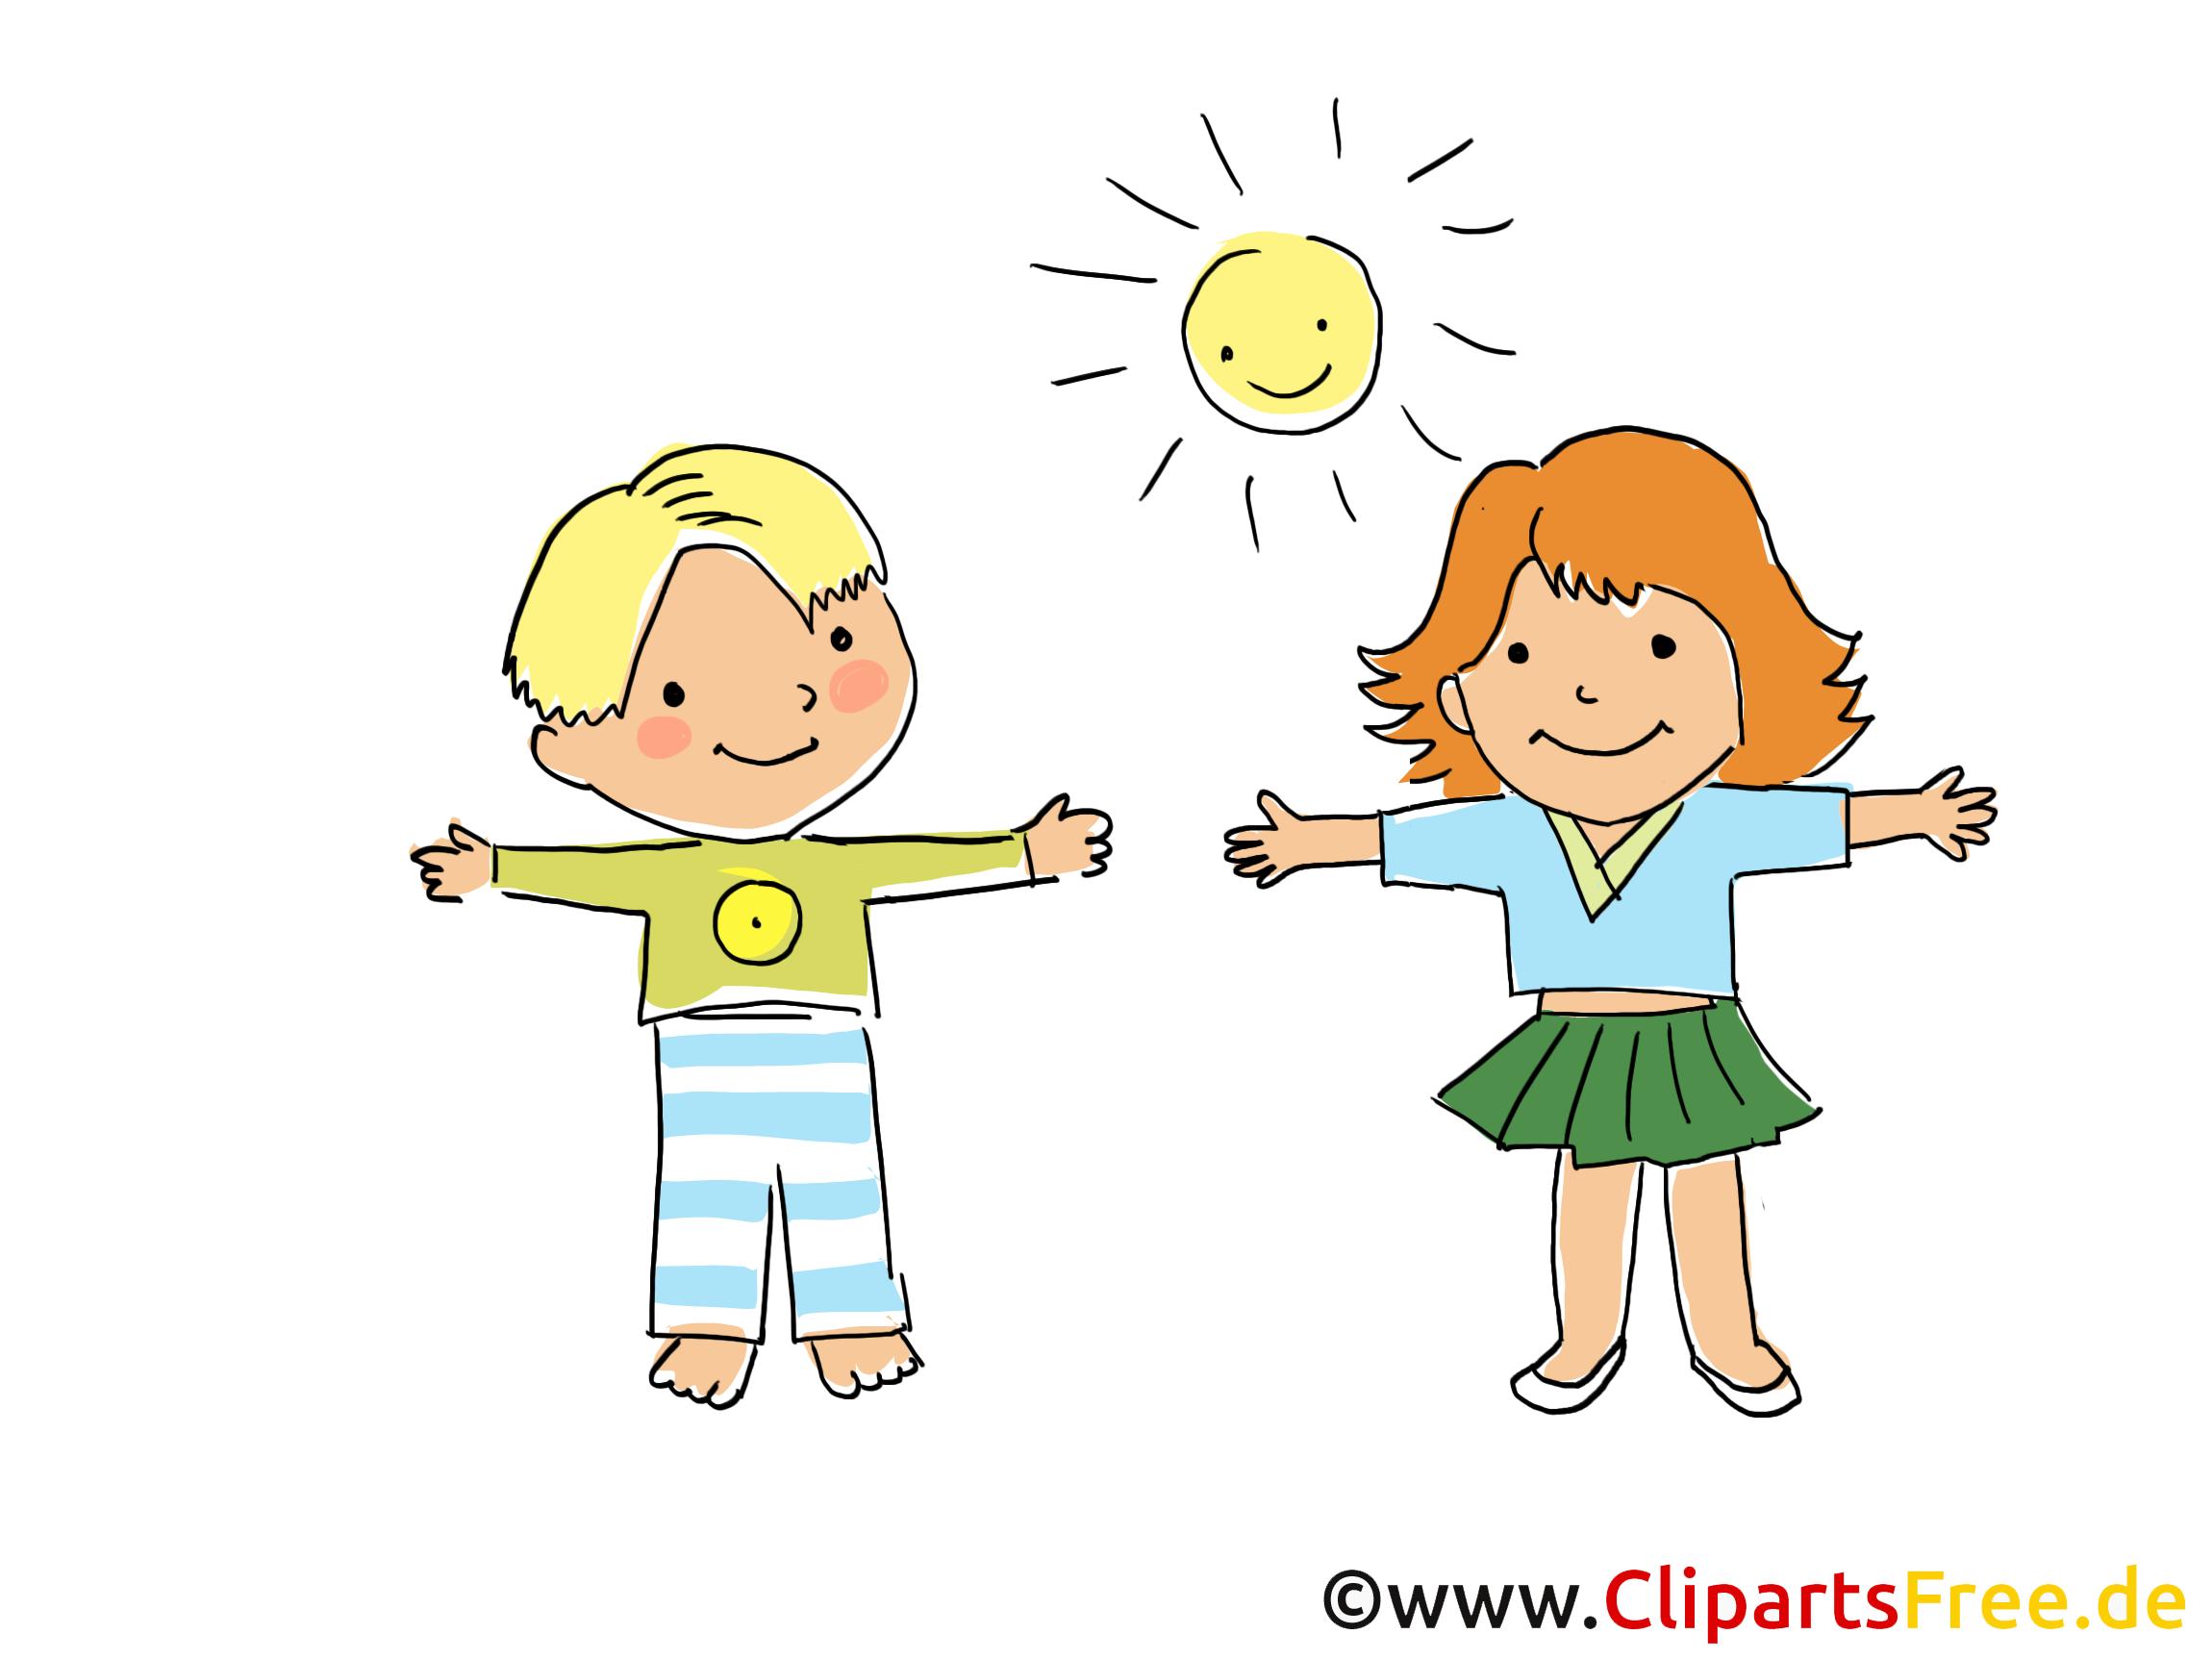 Kinder treiben Sport Bild, Clipart, Cartoon, Grafik, Comic gratis